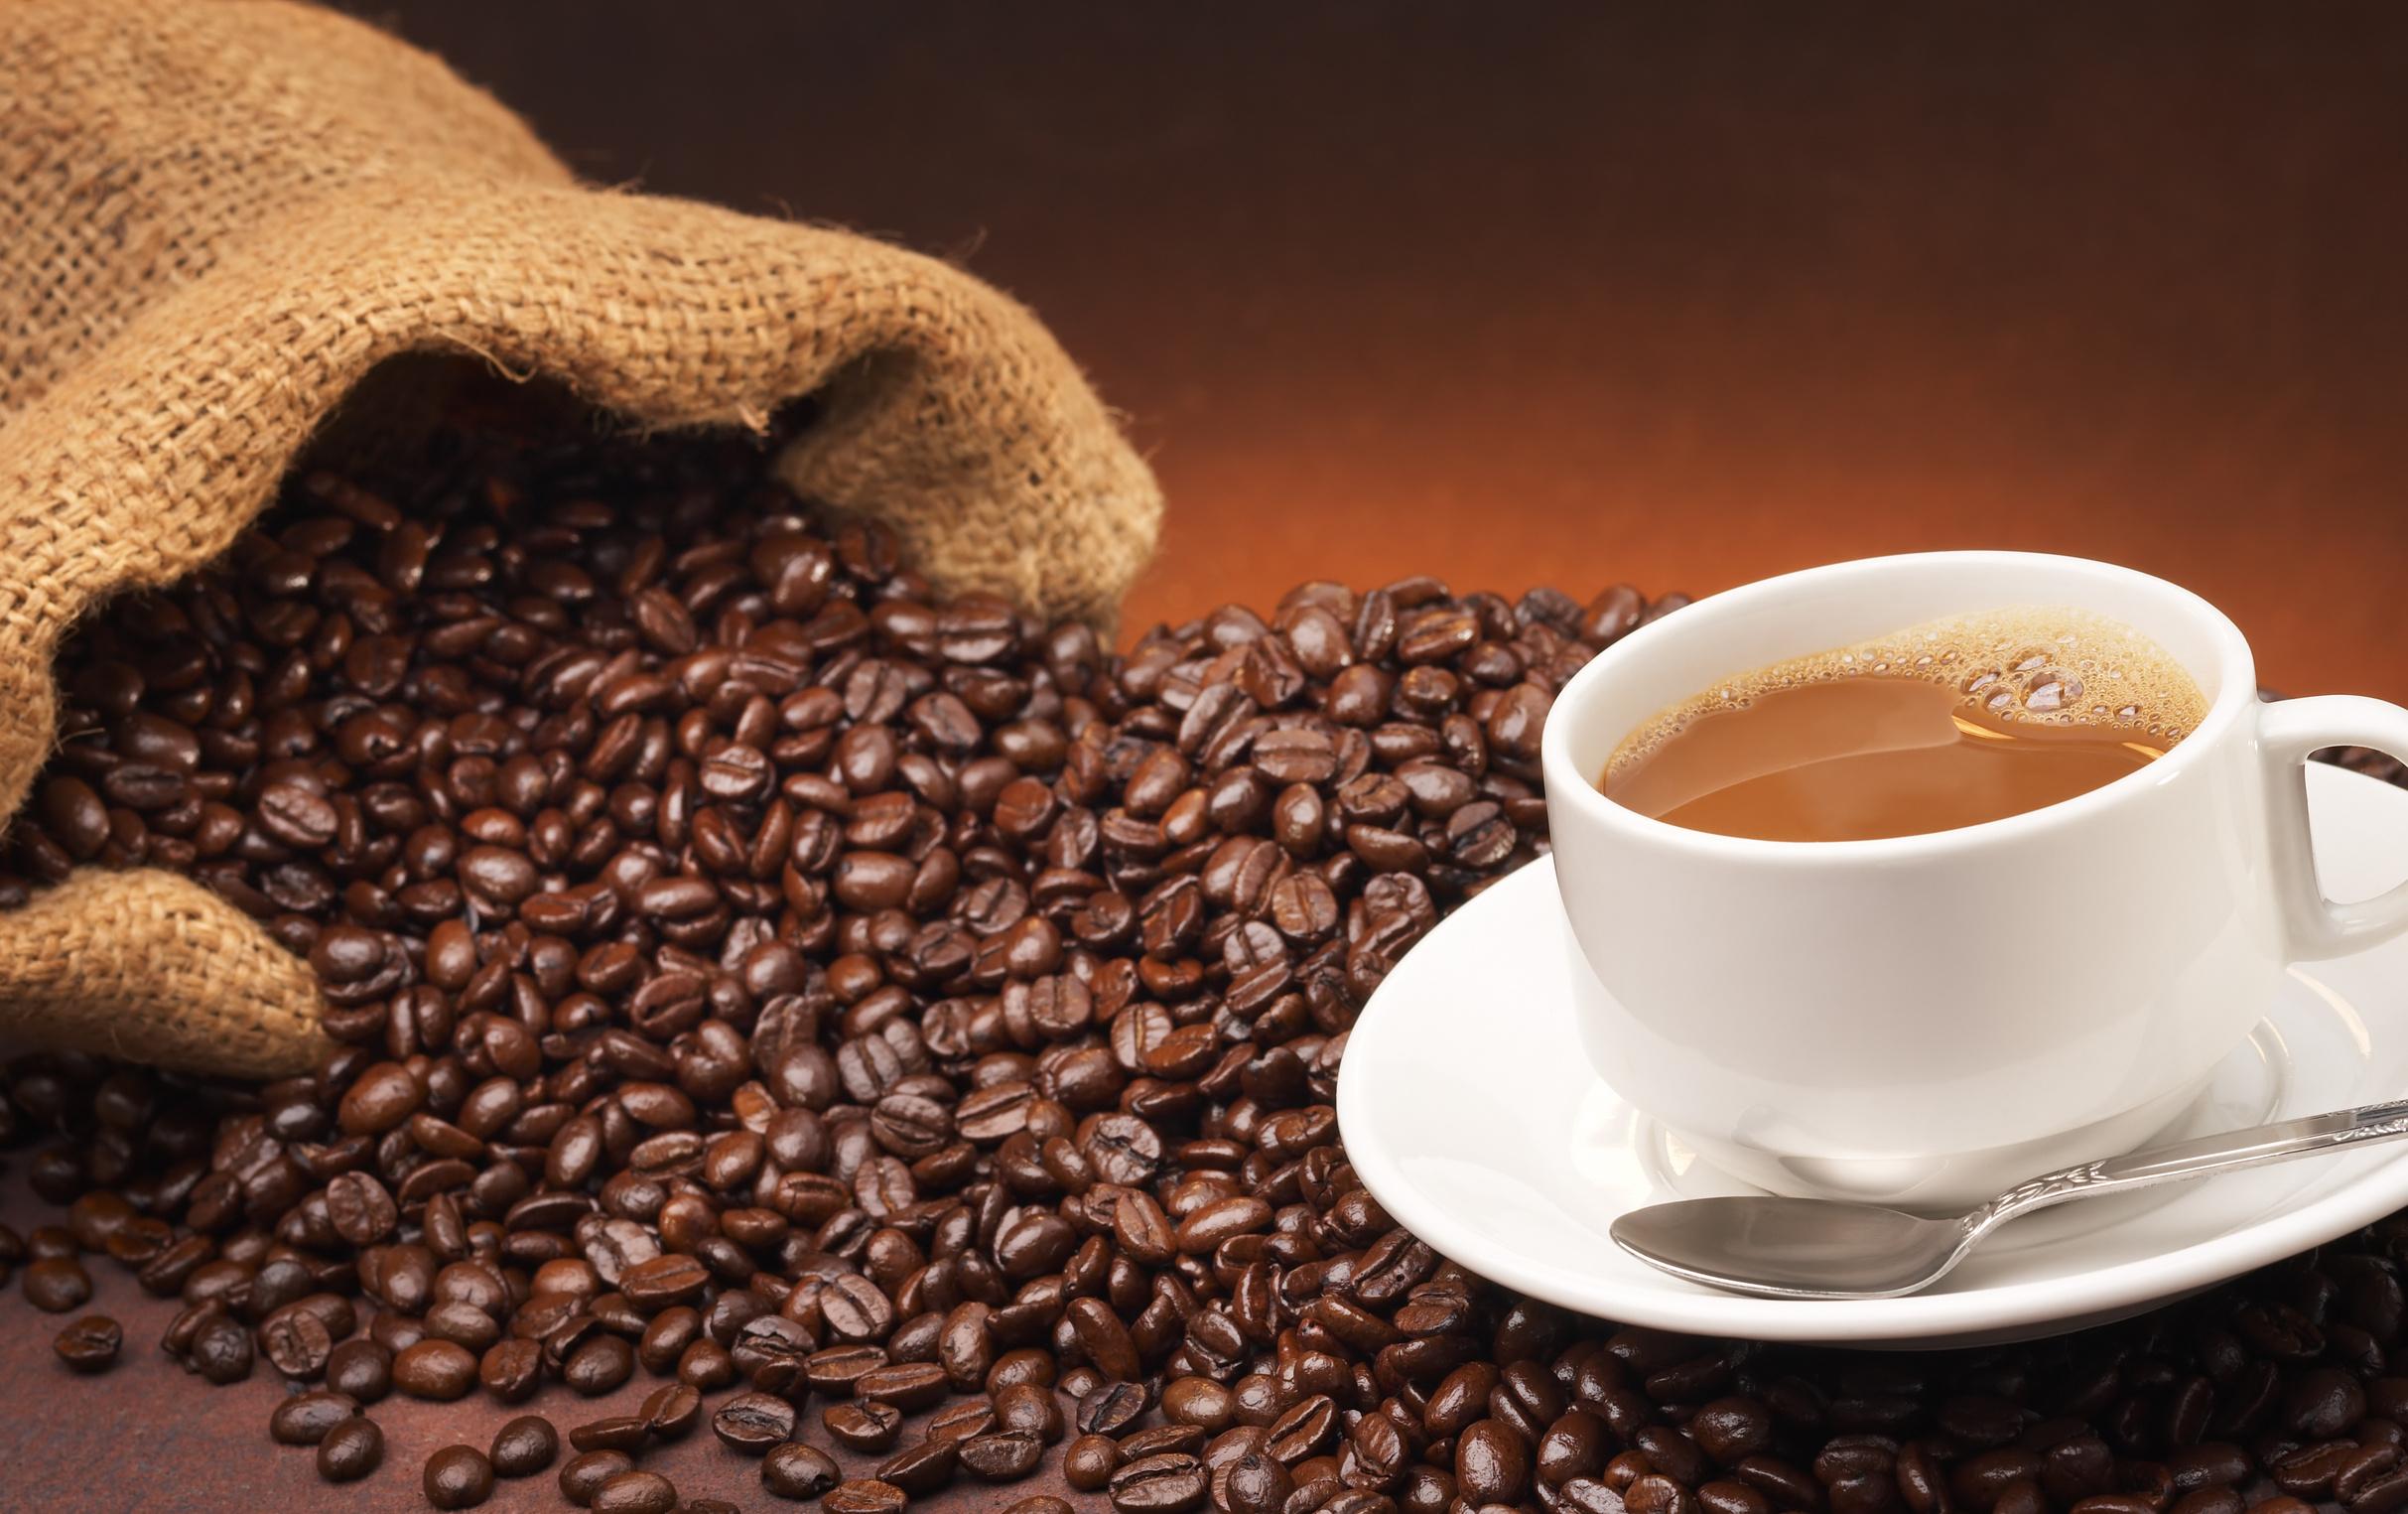 Kaffeeautomat kaufen